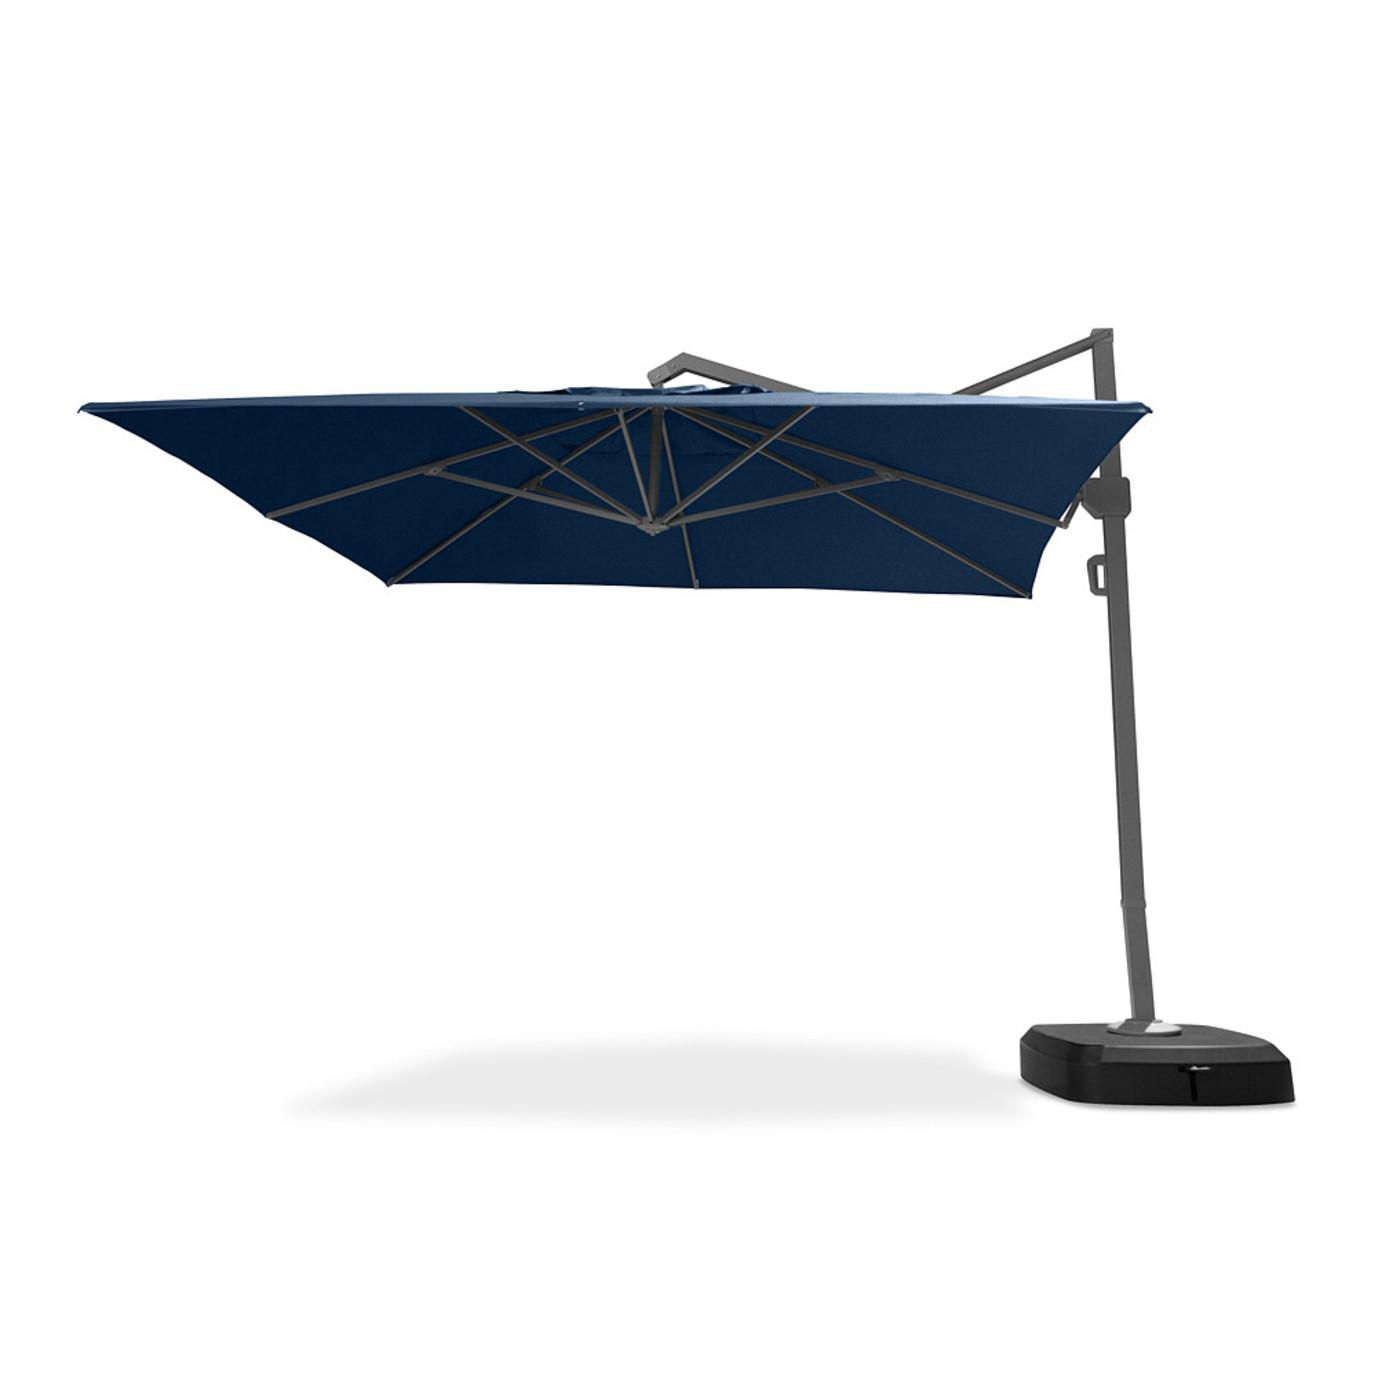 Portofino Commercial 12ft Umbrella Laguna Blue By Rst